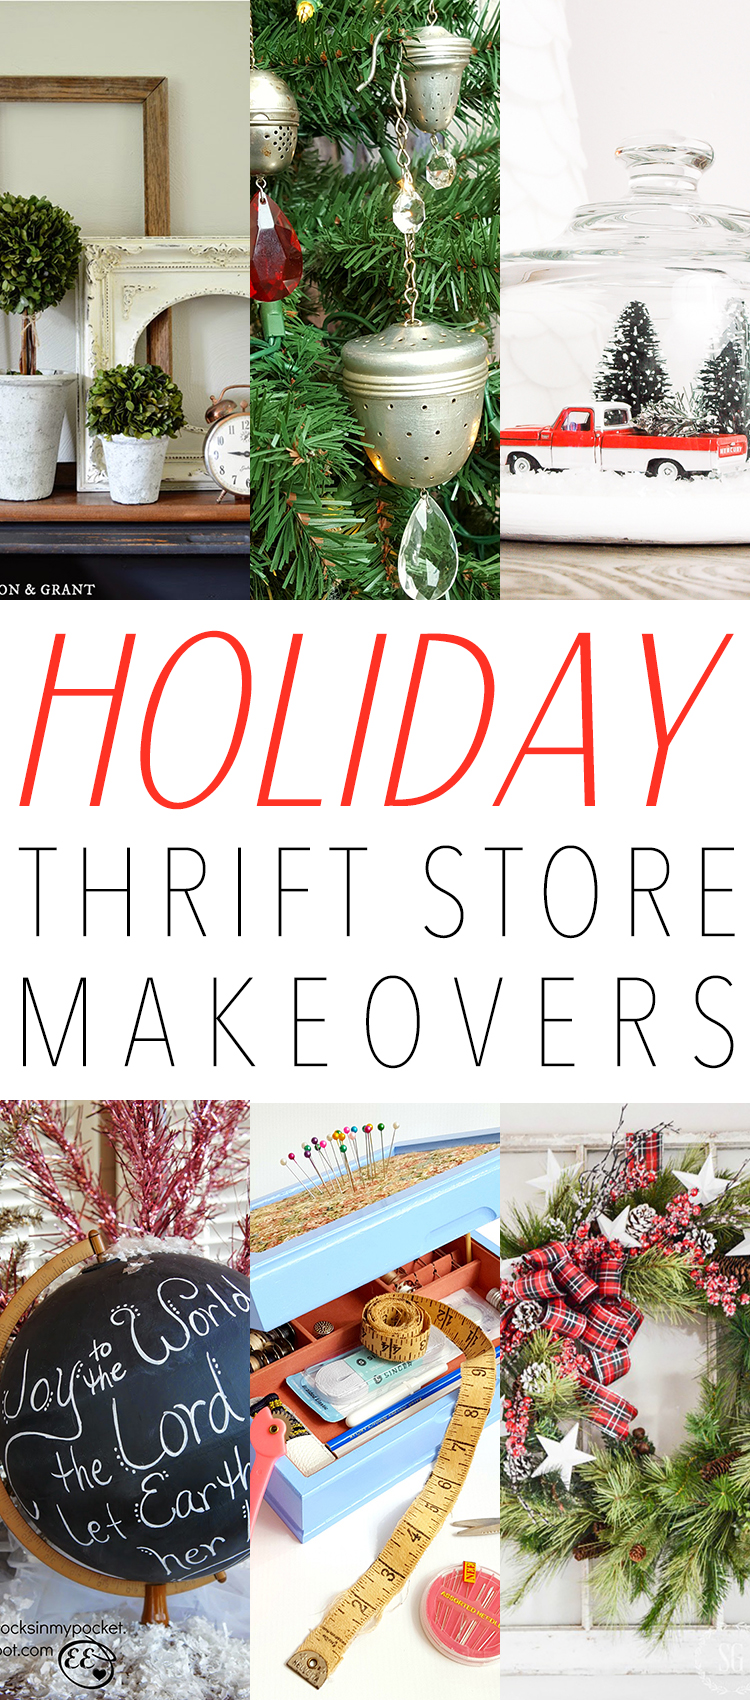 ThriftStoreMakeover-tower-00001